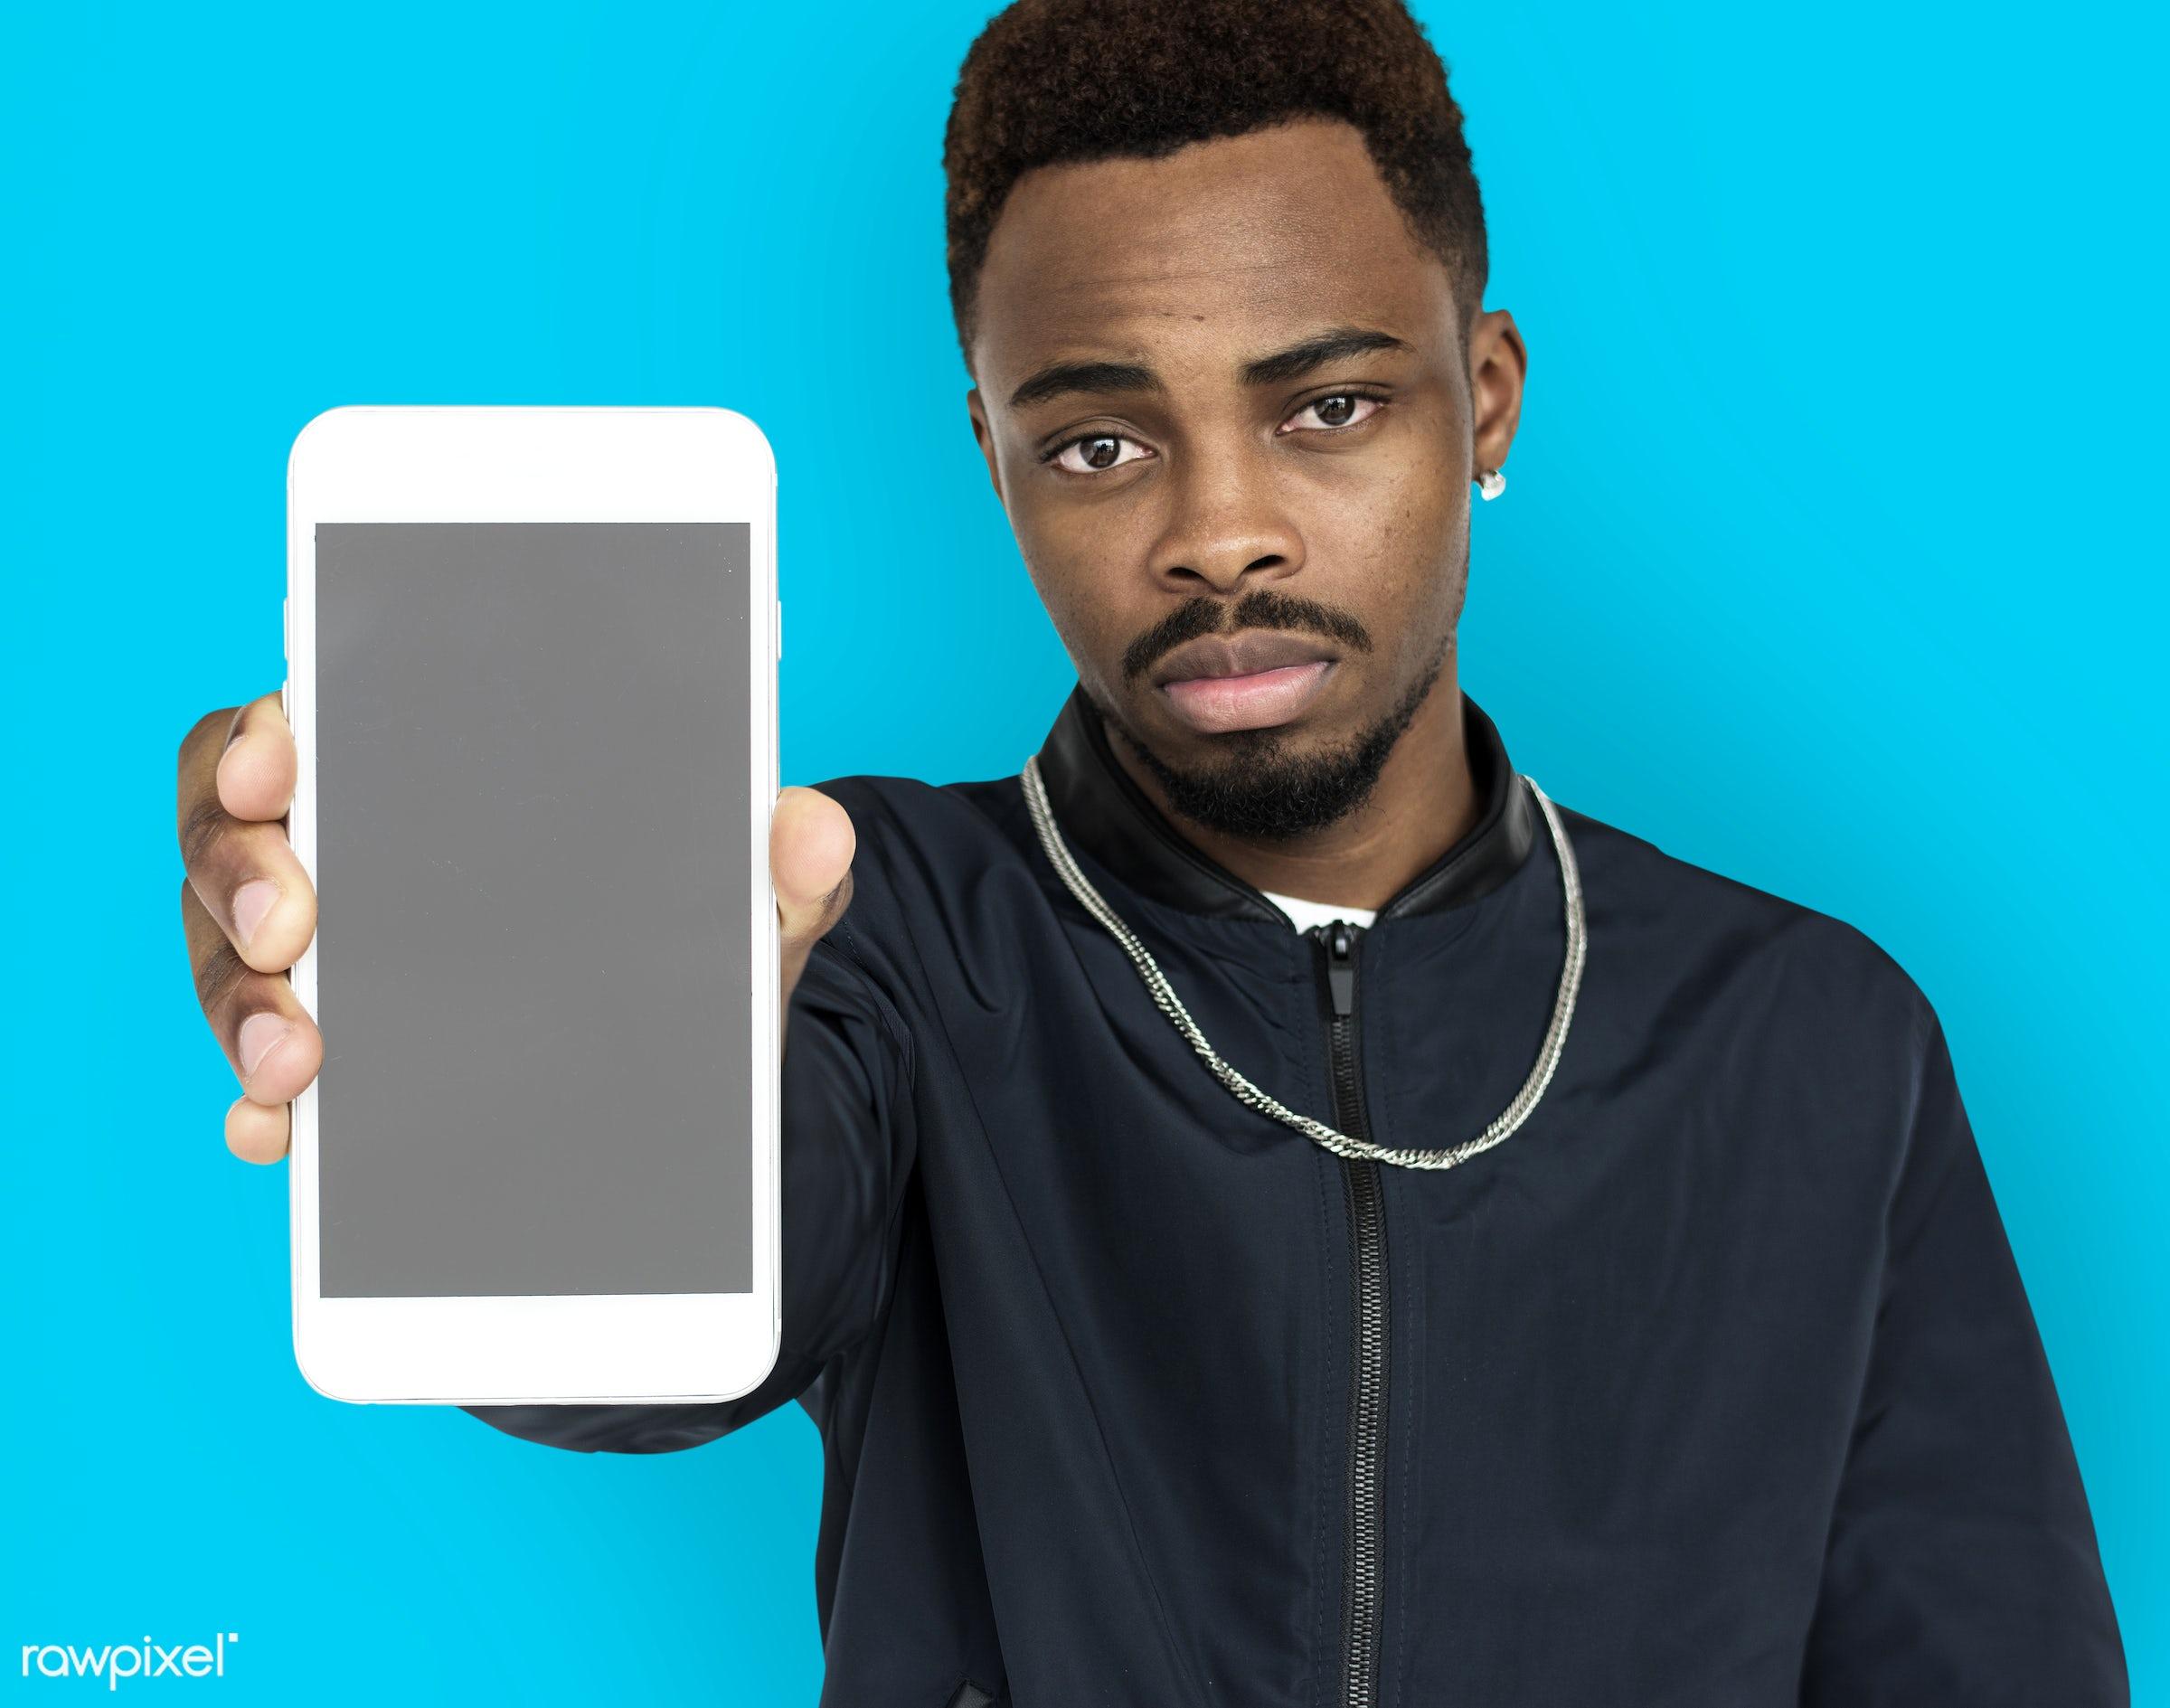 african descent, background, beard, black, blue, communication, device, emotion, expression, focused, holding, holding phone...